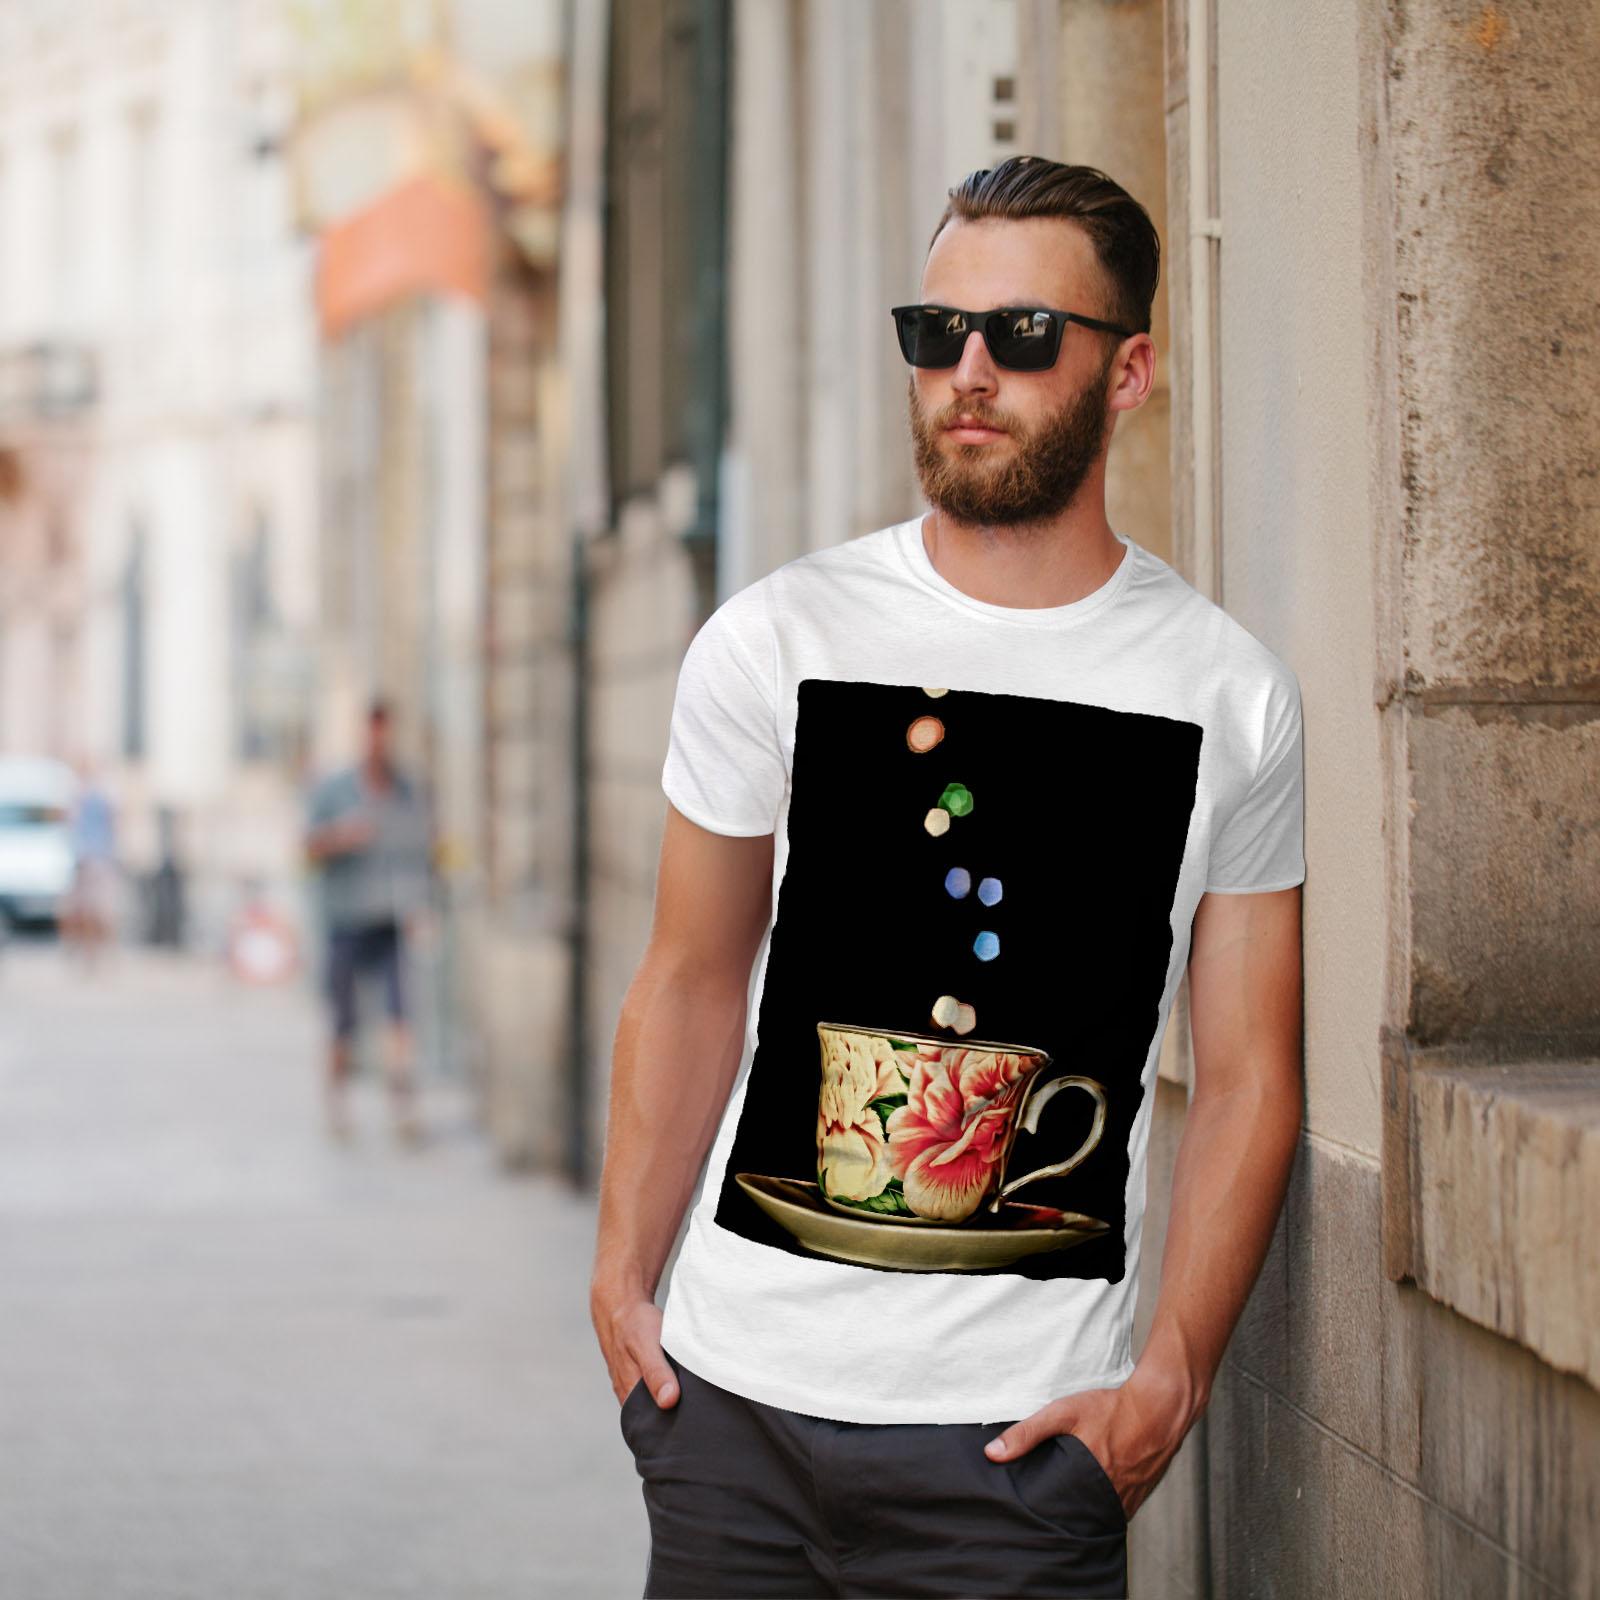 Wellcoda-Tea-Cup-Retro-Old-Mens-T-shirt-Smell-Graphic-Design-Printed-Tee thumbnail 11